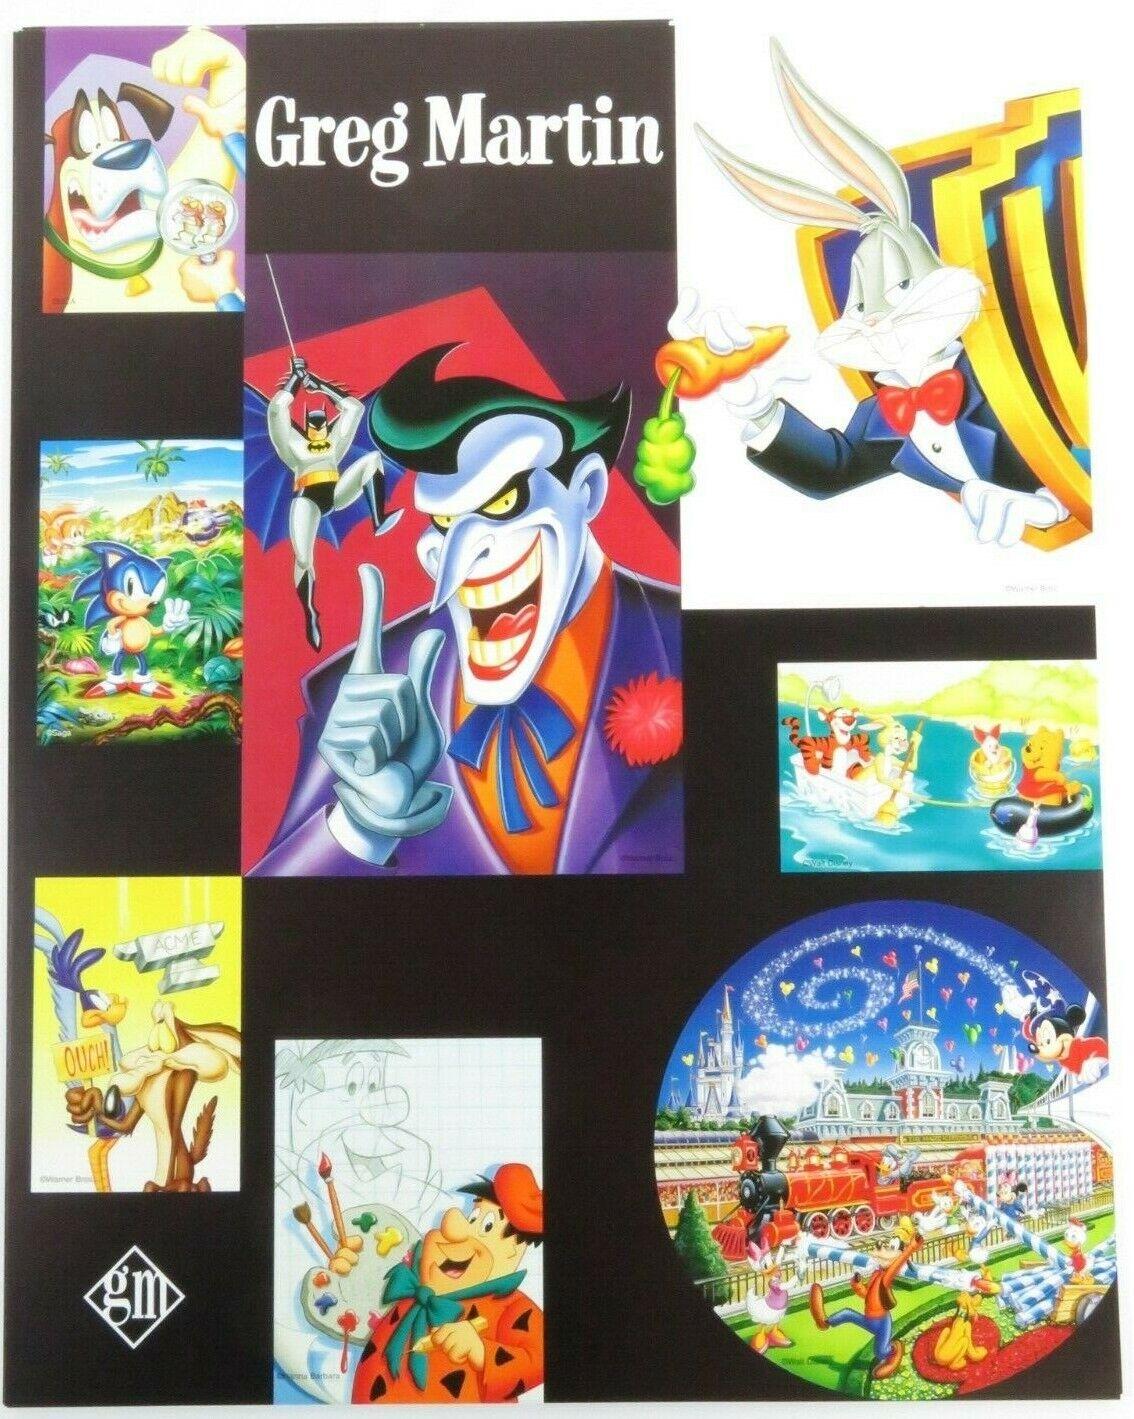 Sonic The Hedgehog Poster Home Decor 16.5x11.25 Inches Anime Manga